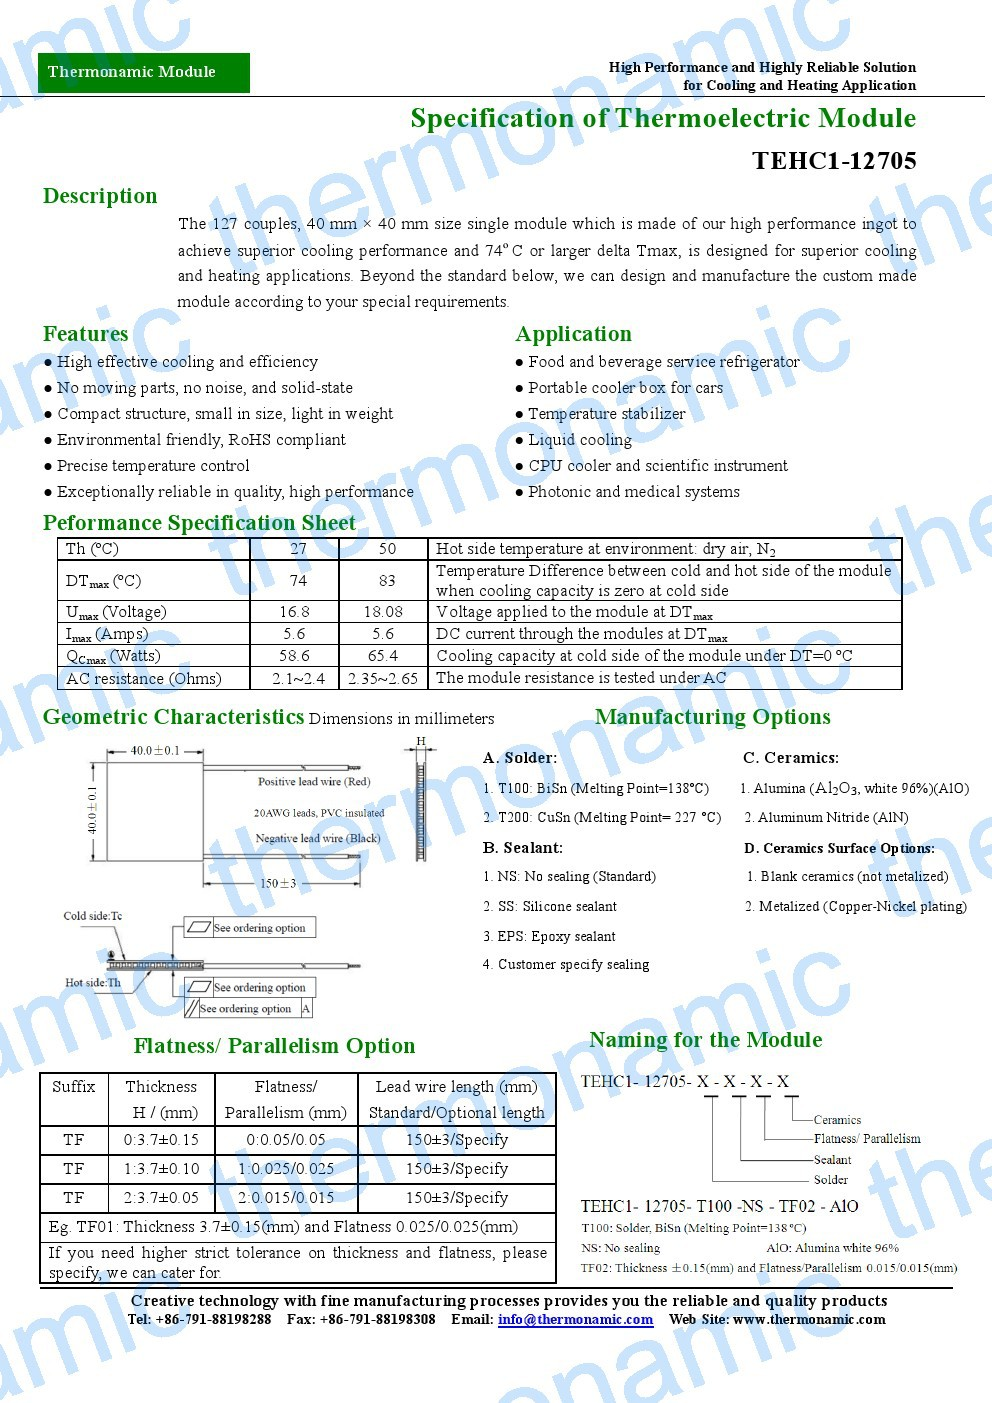 Peltier Module TEHC1-12705